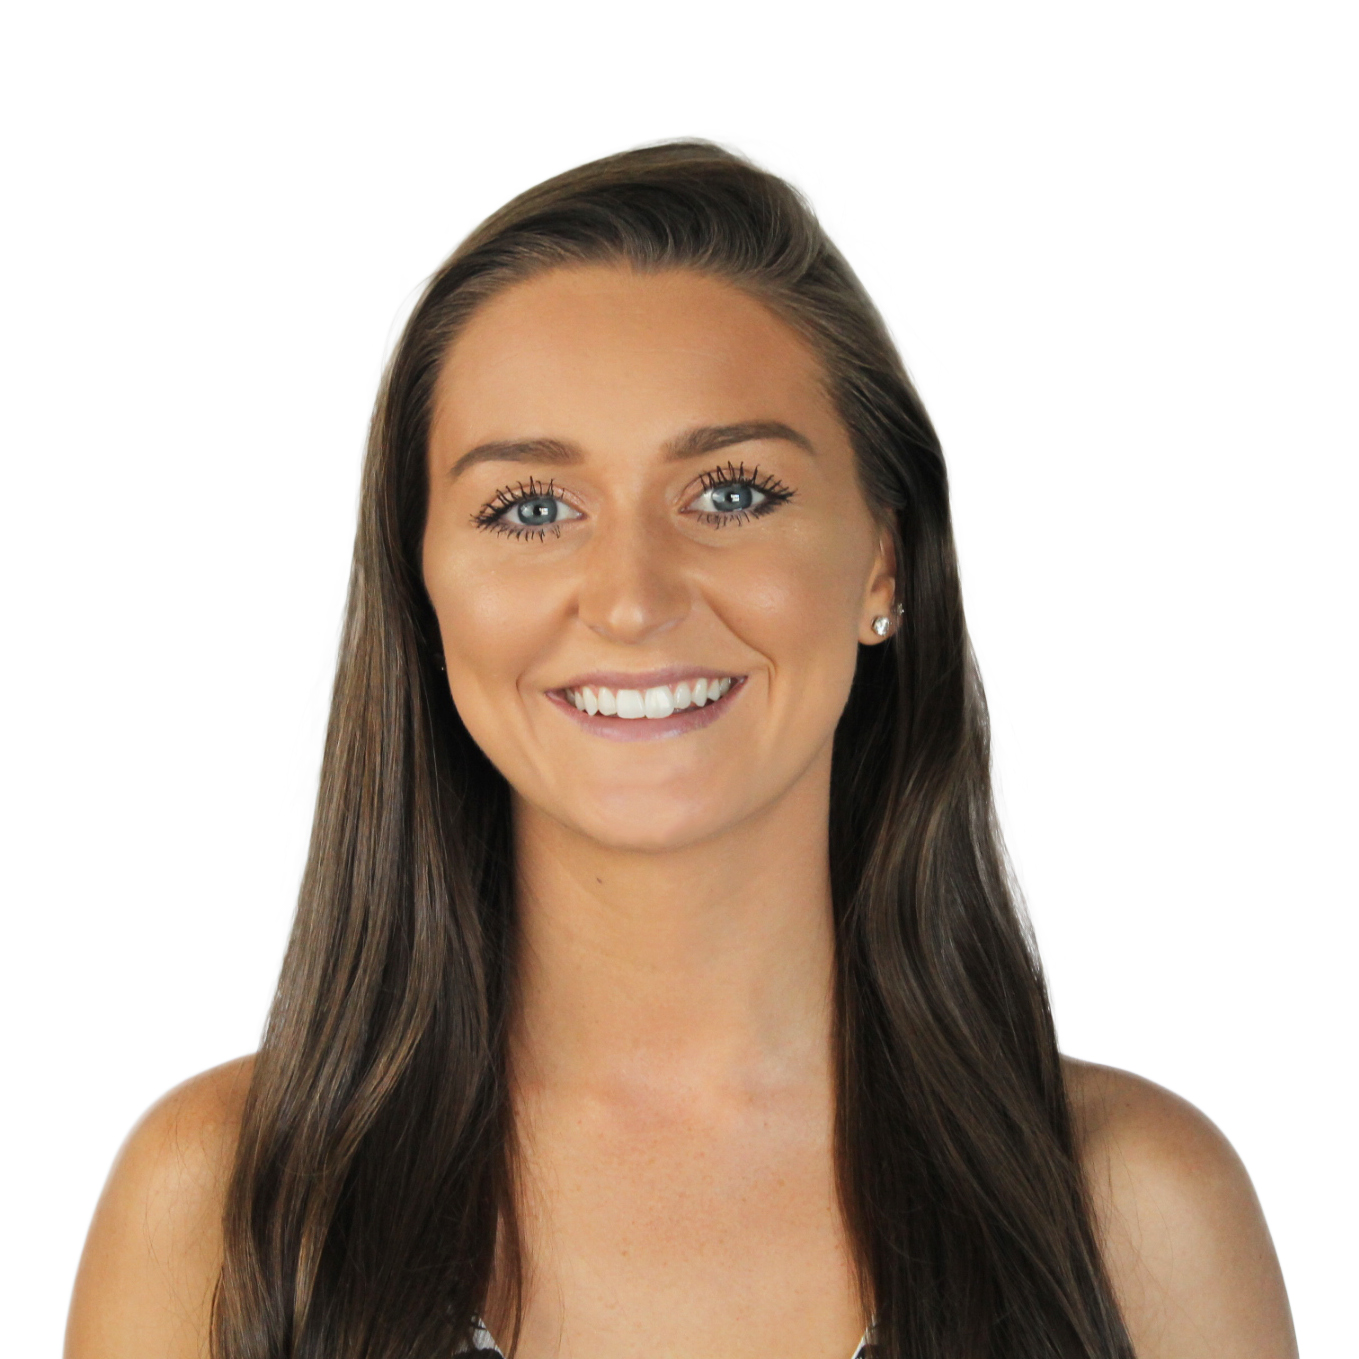 Brielle Dougherty